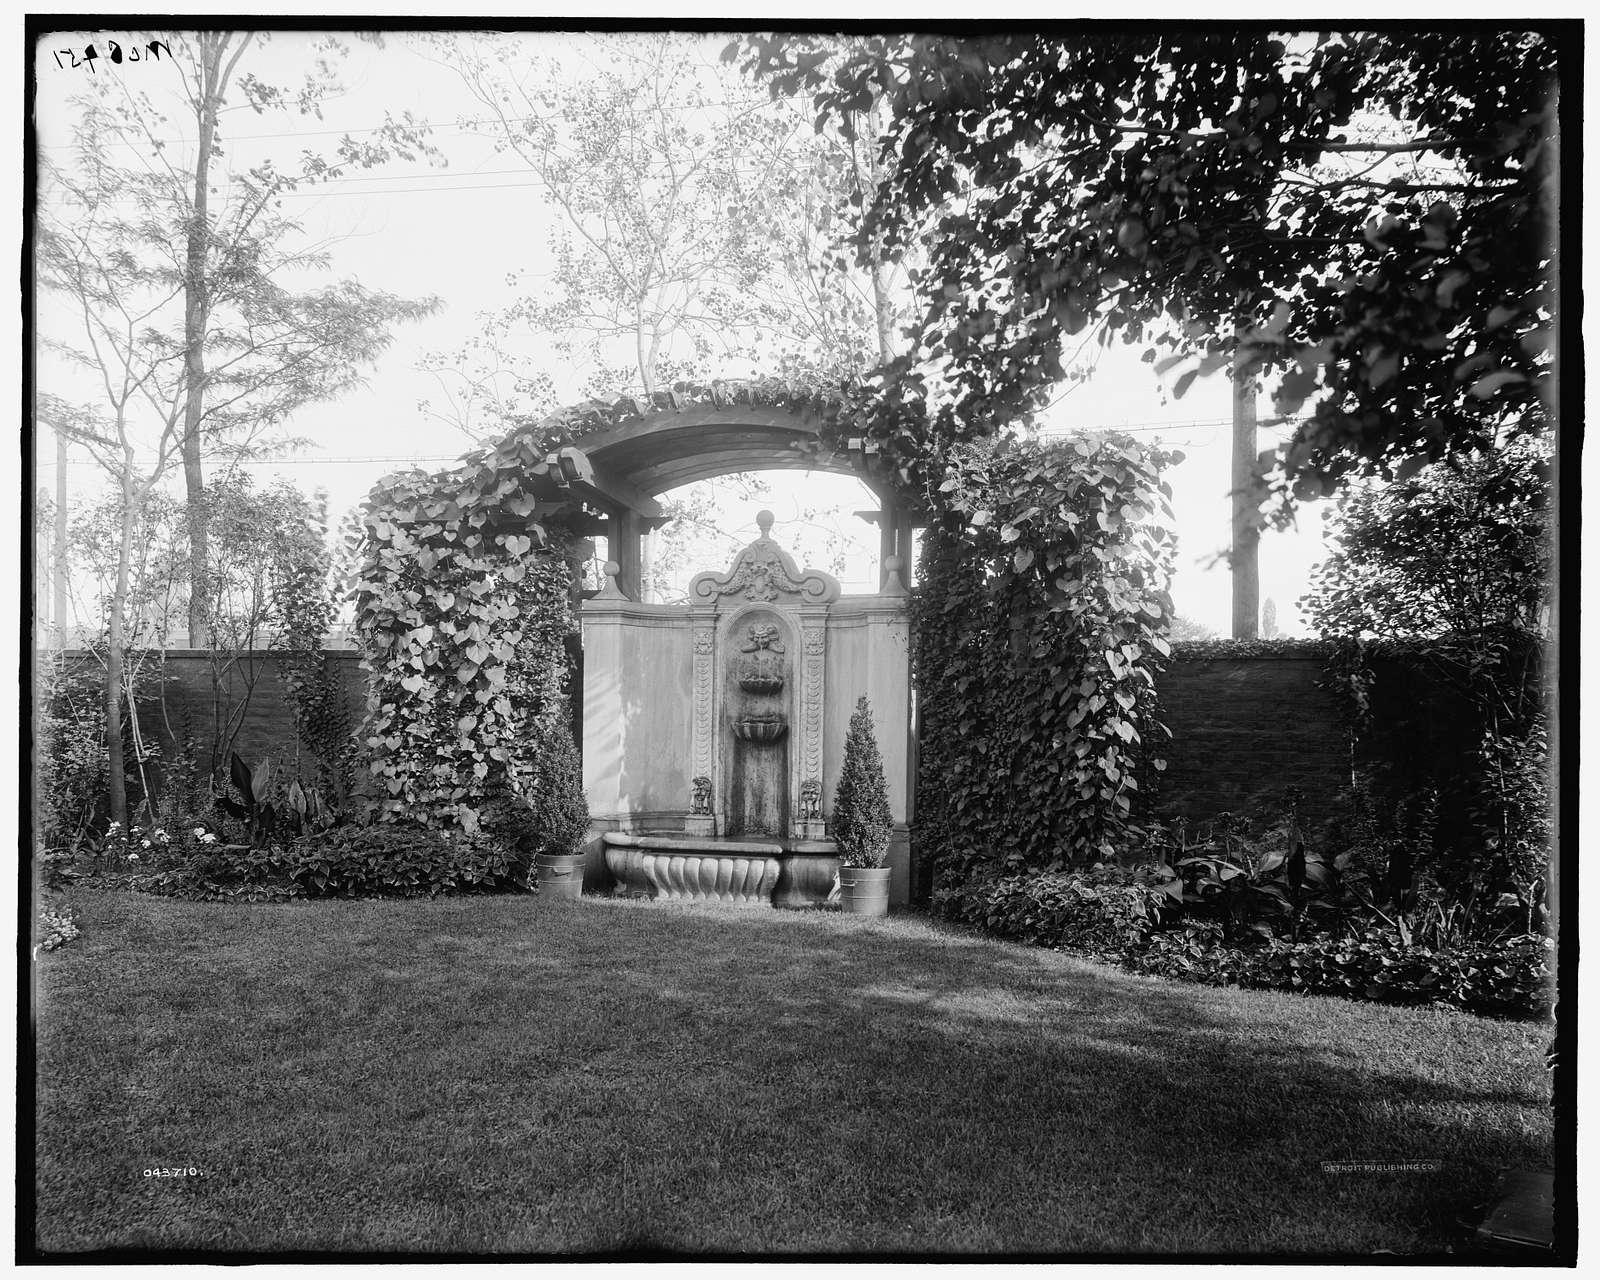 Detroit, Mich., Franklin H. Walker residence, fountain